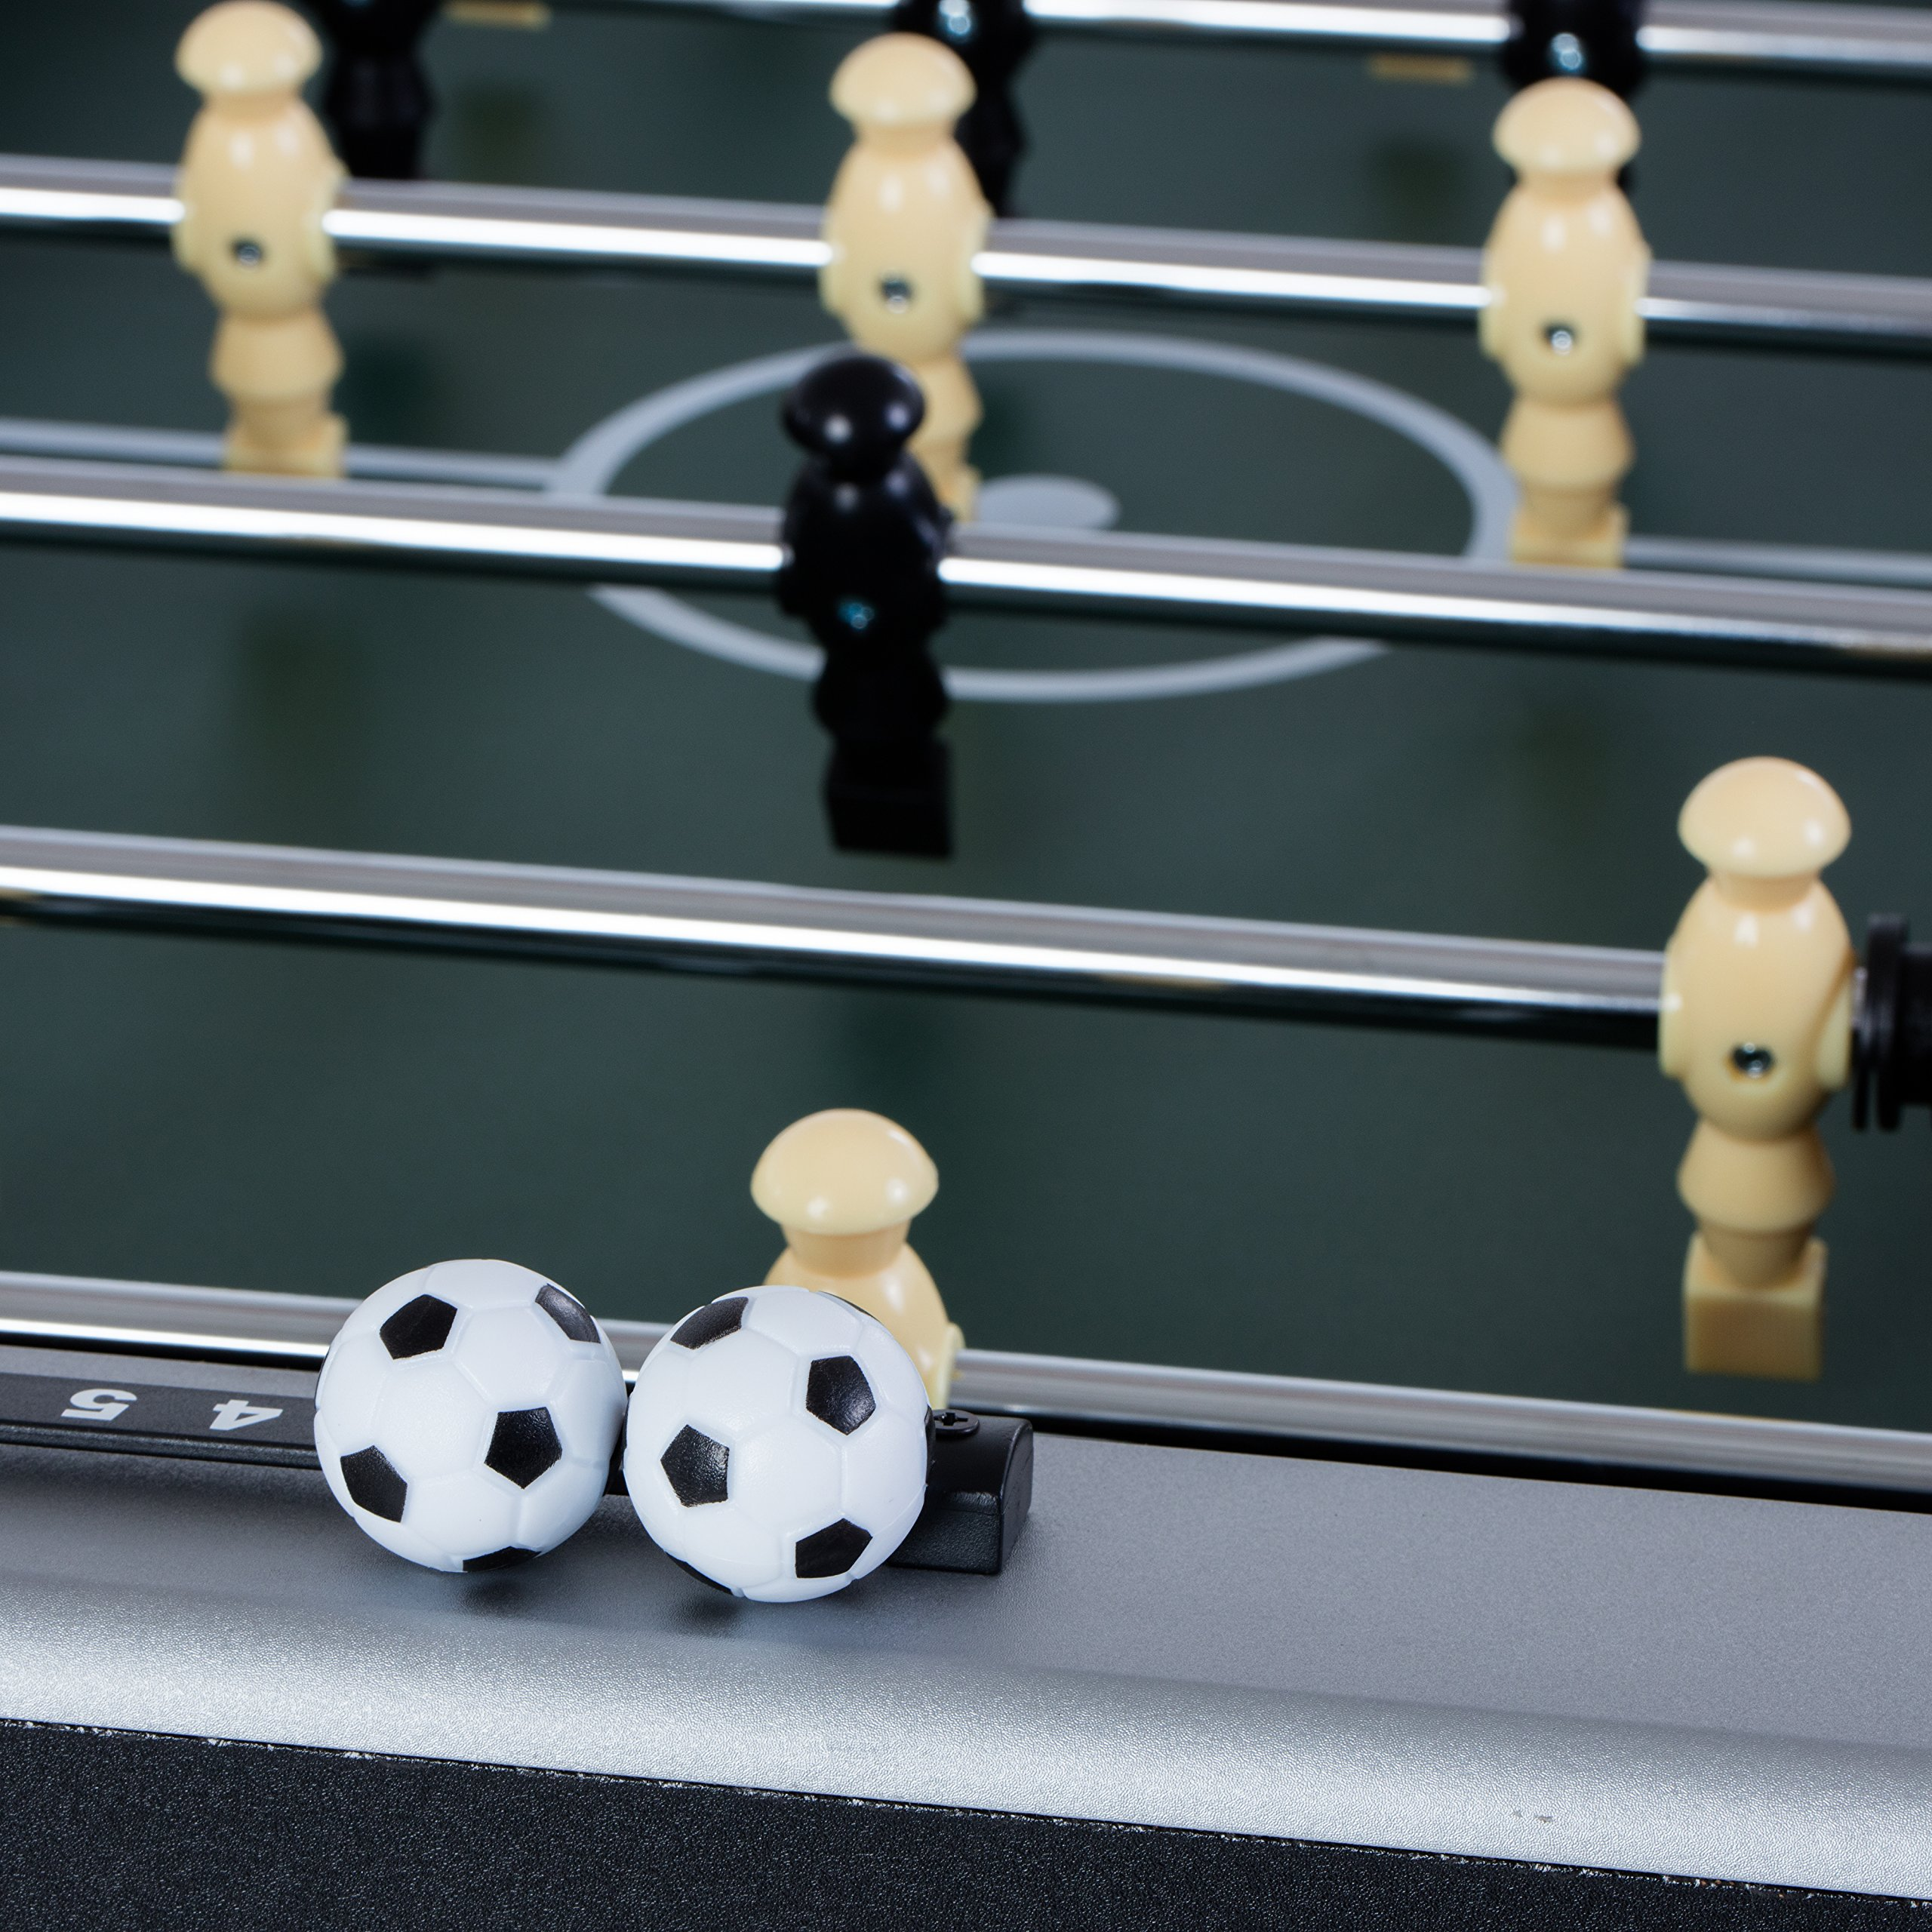 12. The 48-inch Triumph Foosball Table